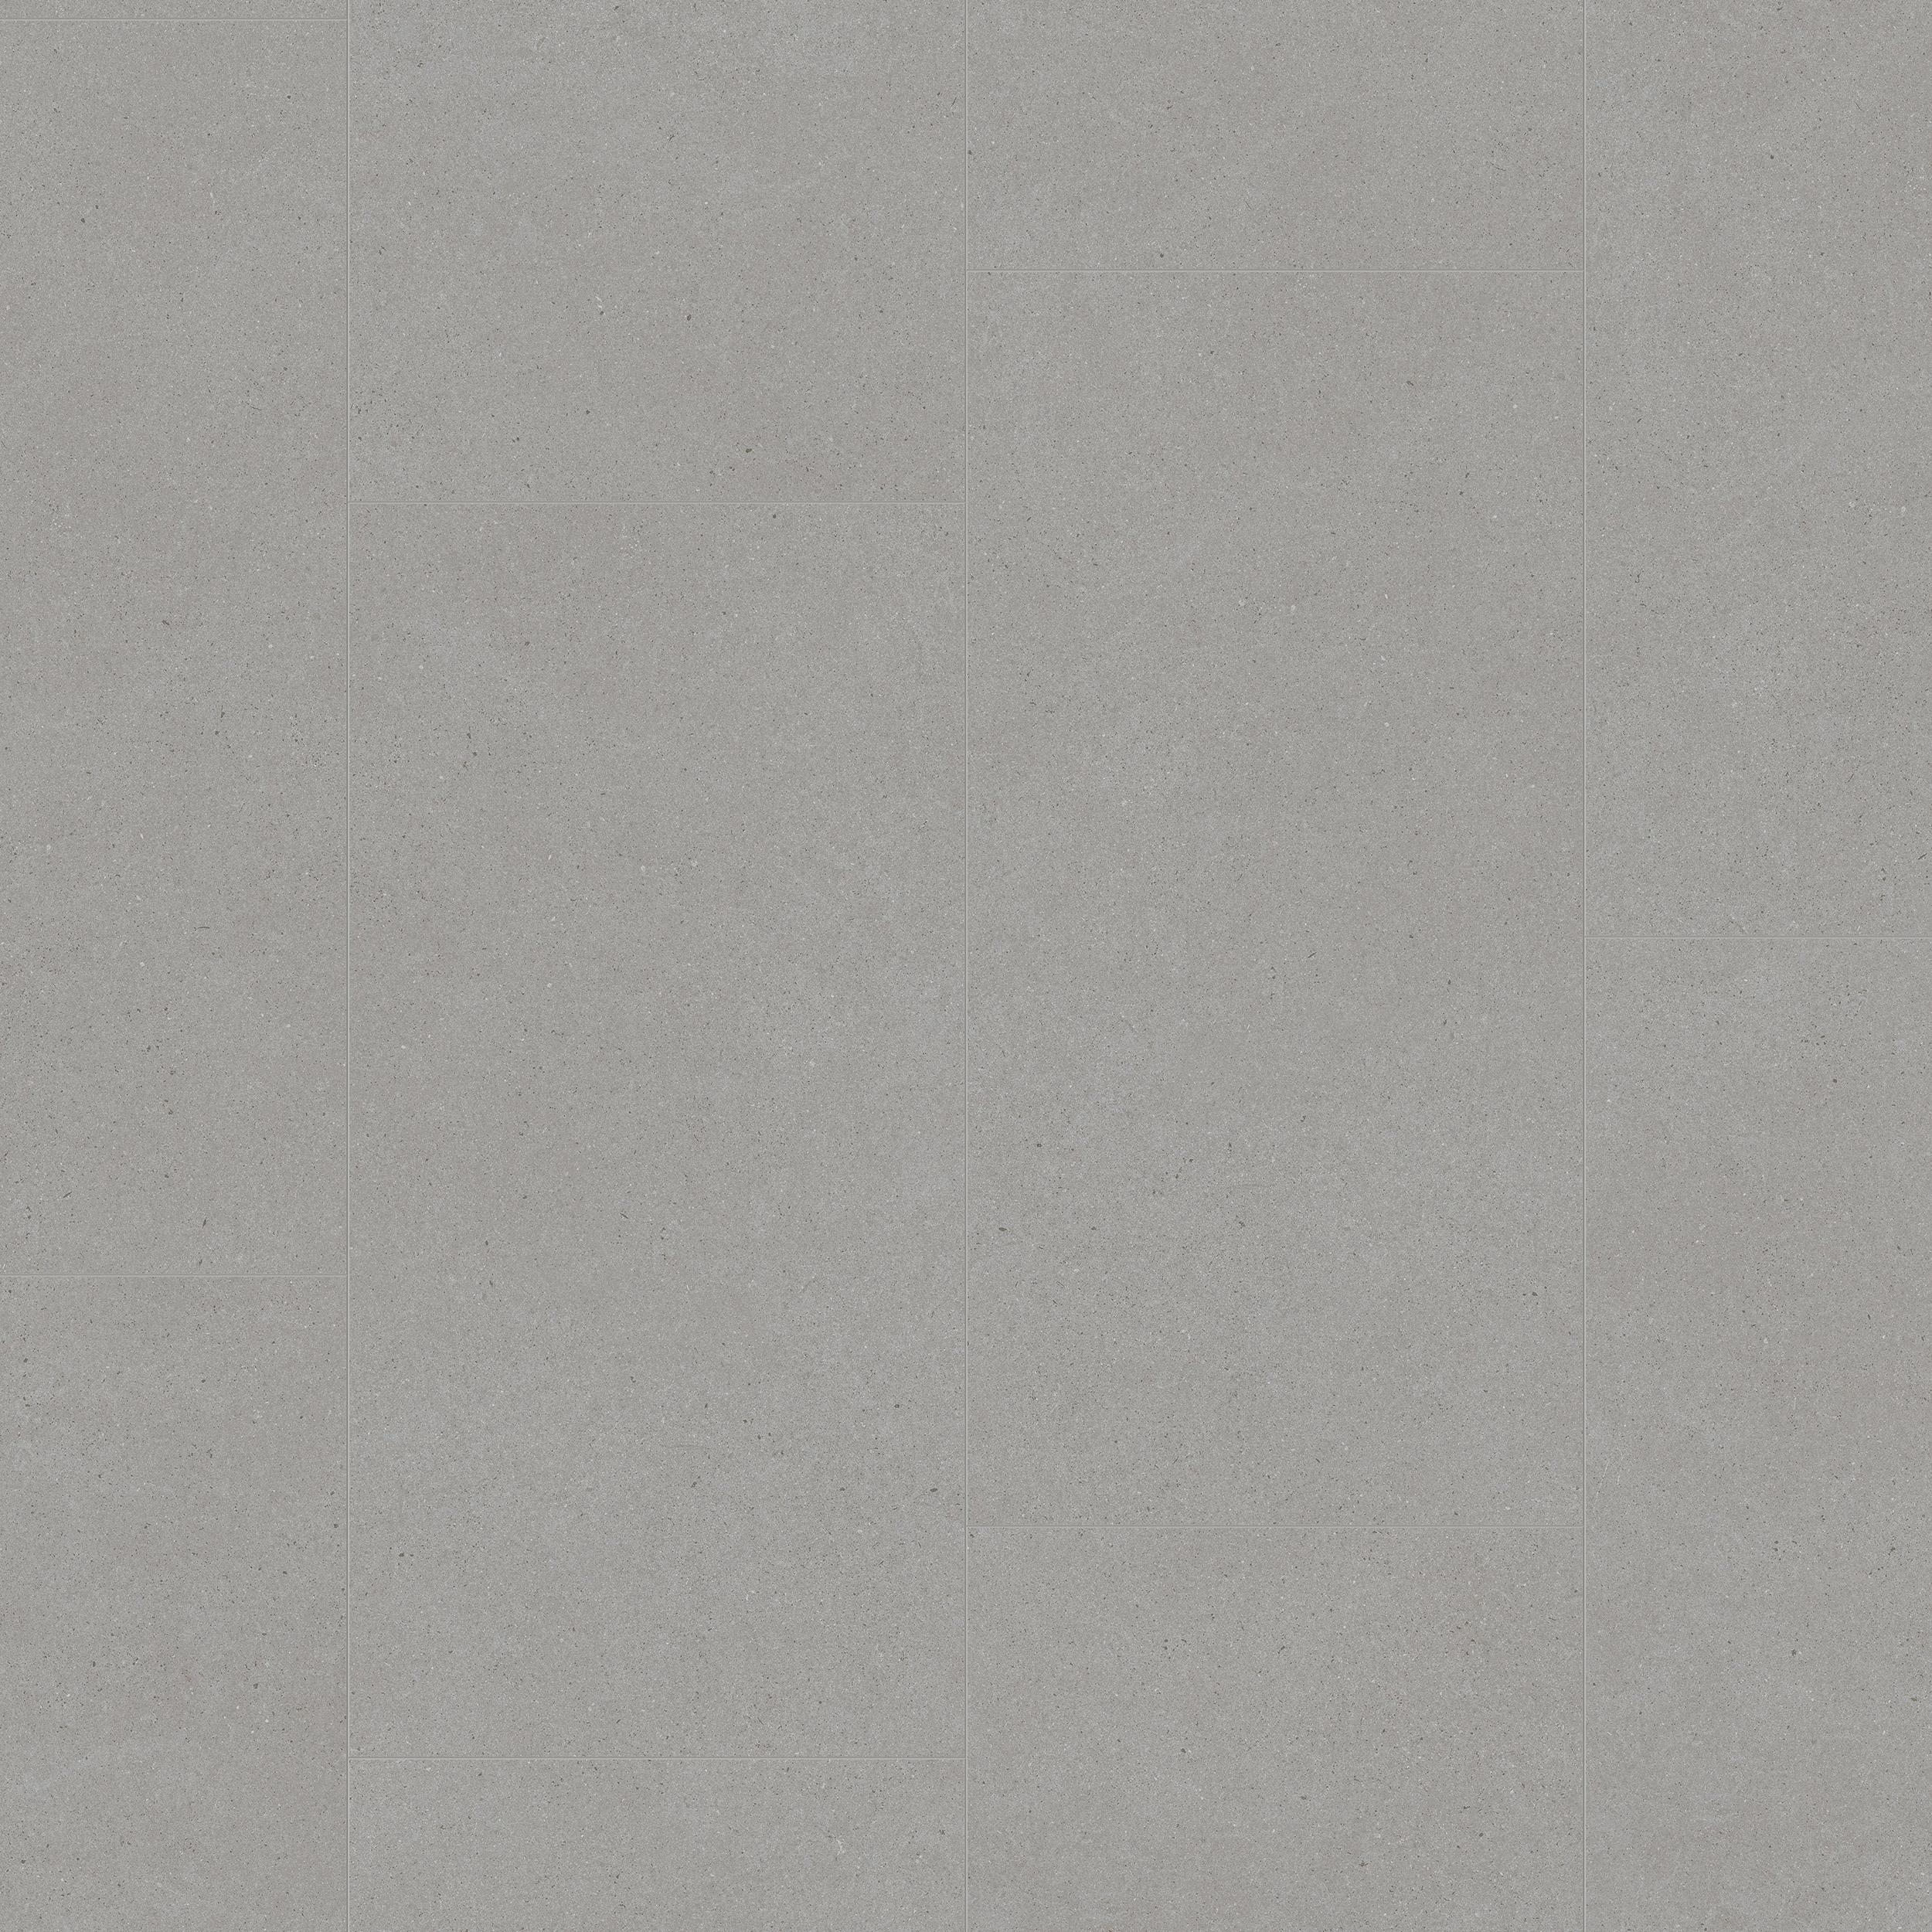 Vinylgolv Pergo Rigid Click Tile Grey Modern Mineral